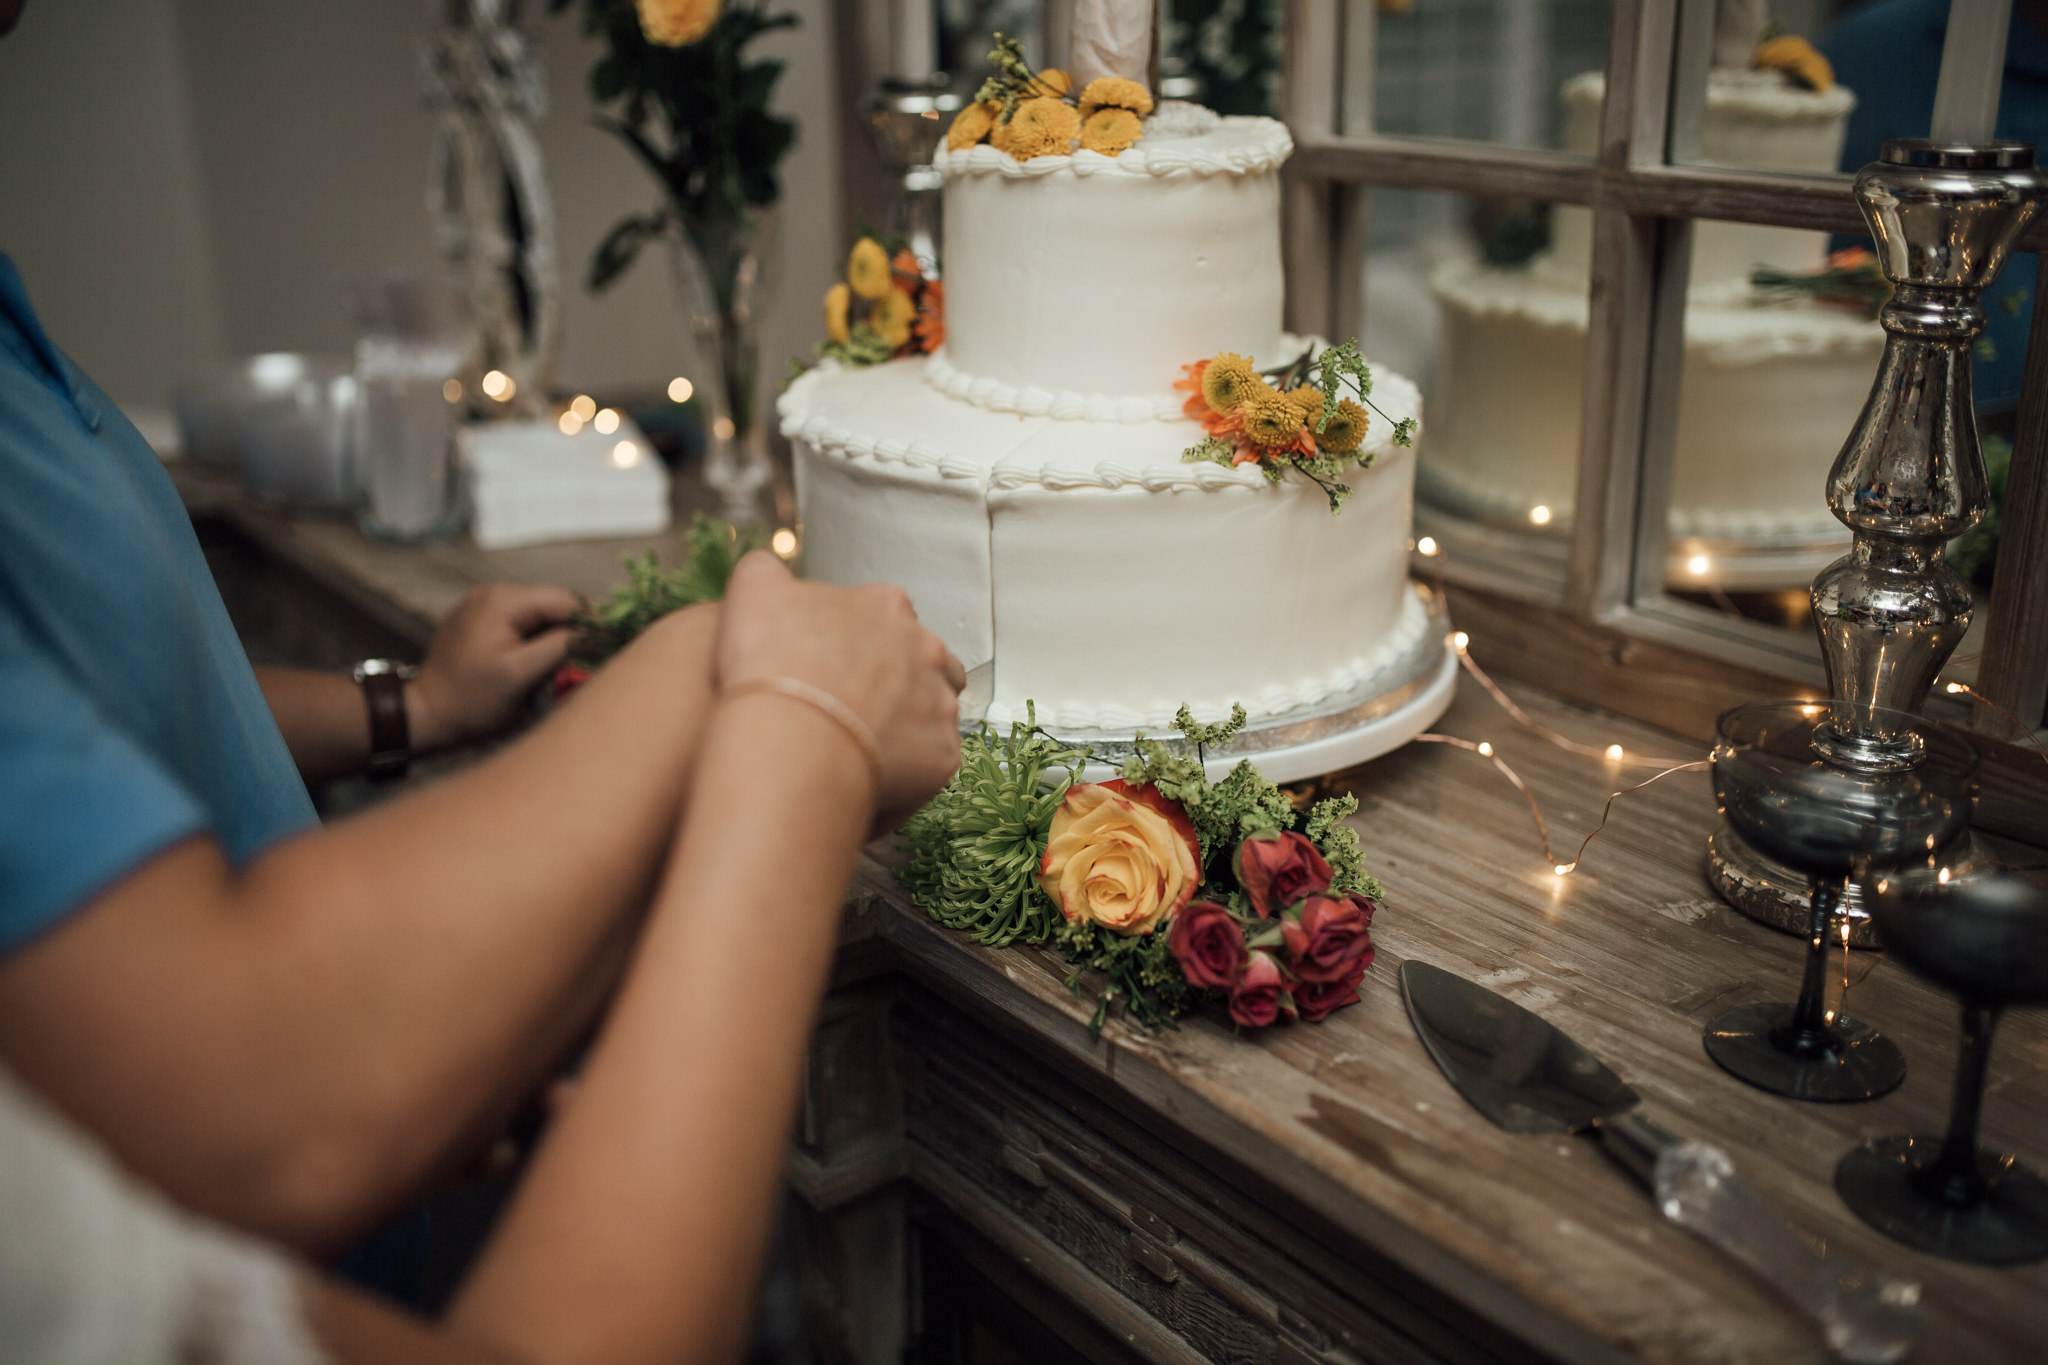 cassie-cook-photography-santa-rosa-beach-wedding-farrar-wedding-83.jpg